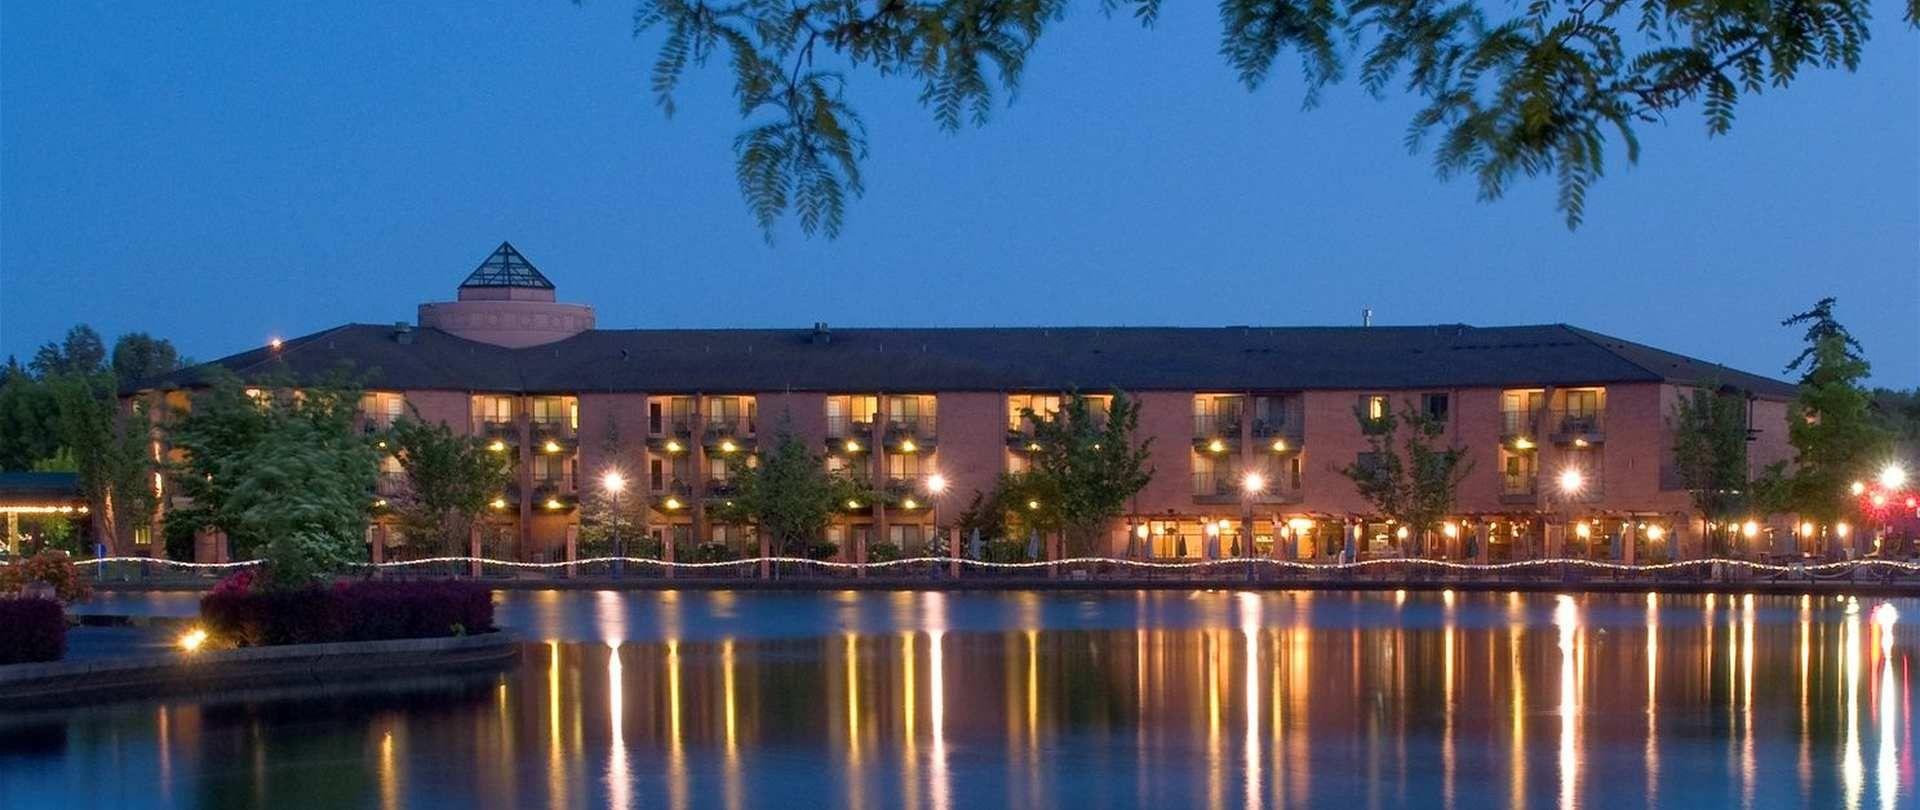 Century Hotel On The Lake At Tualatin Commons